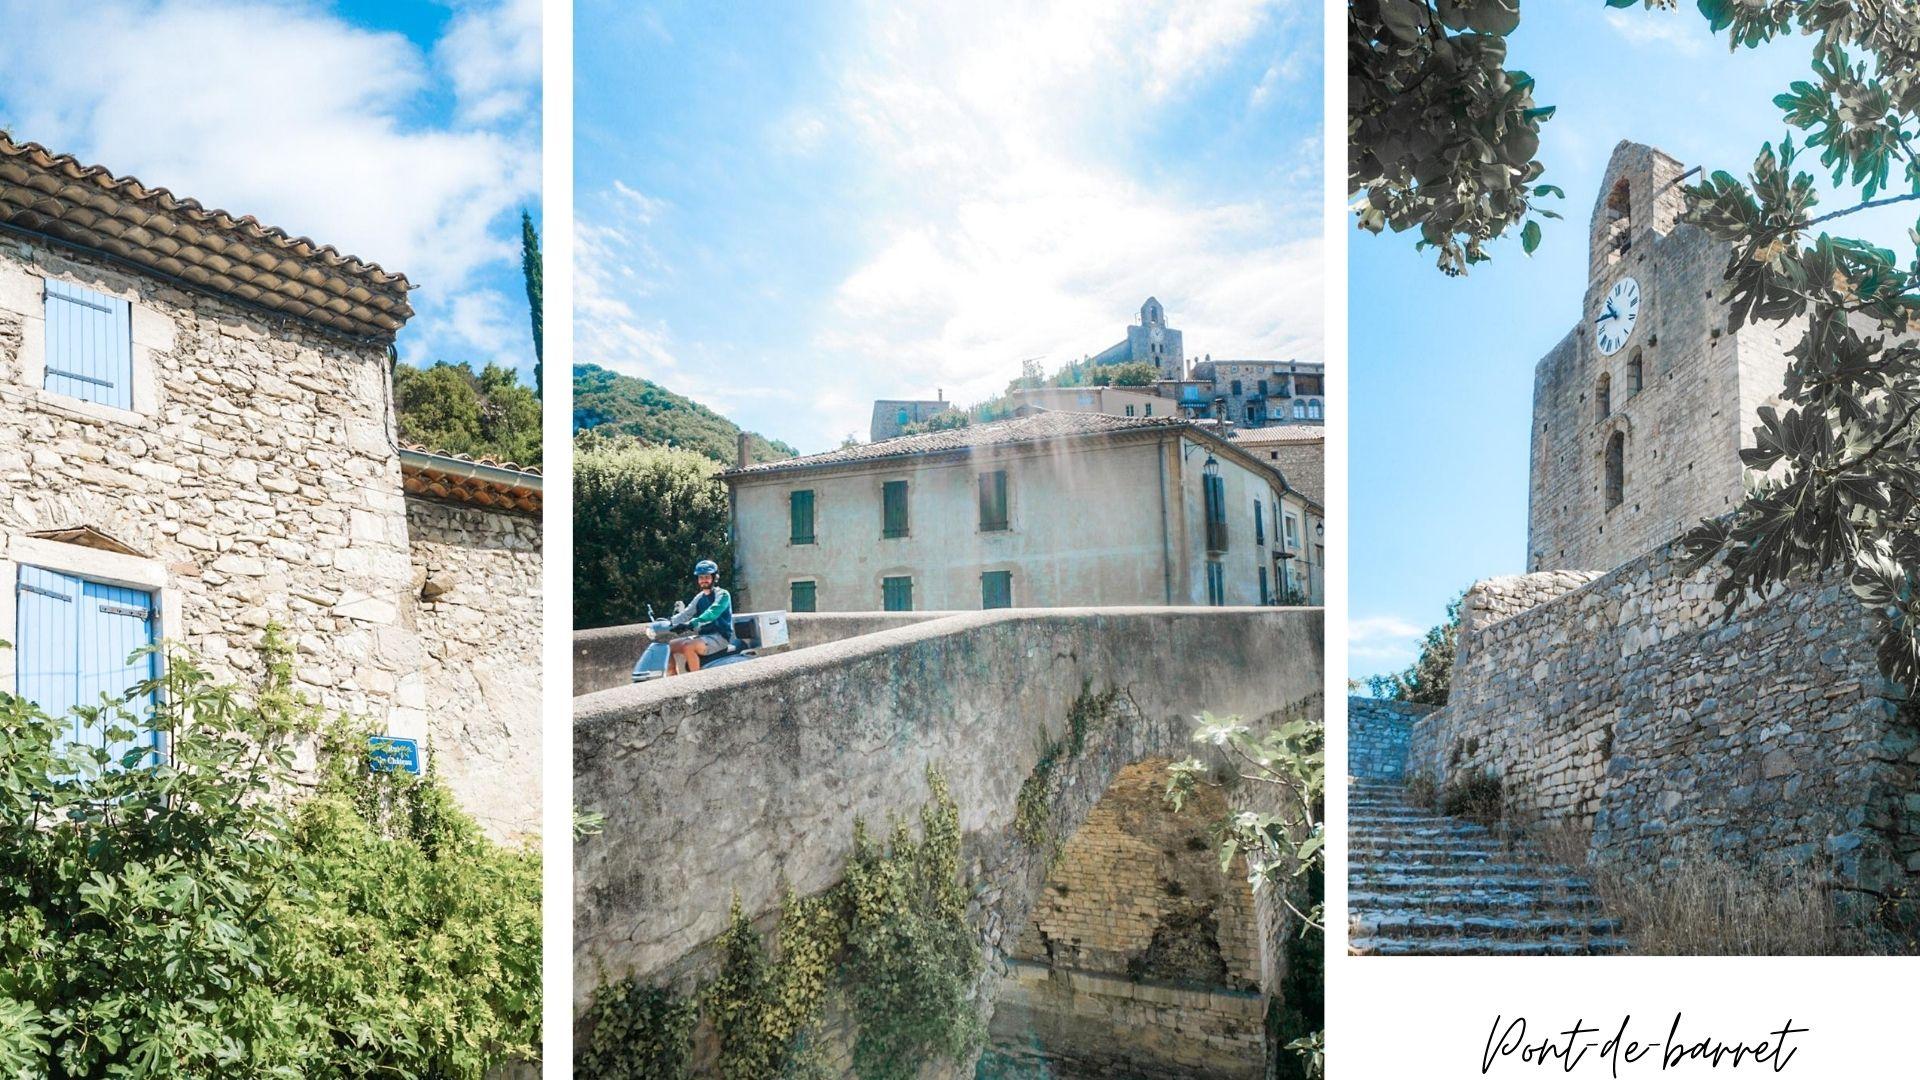 visiter pont de barret drome provençale